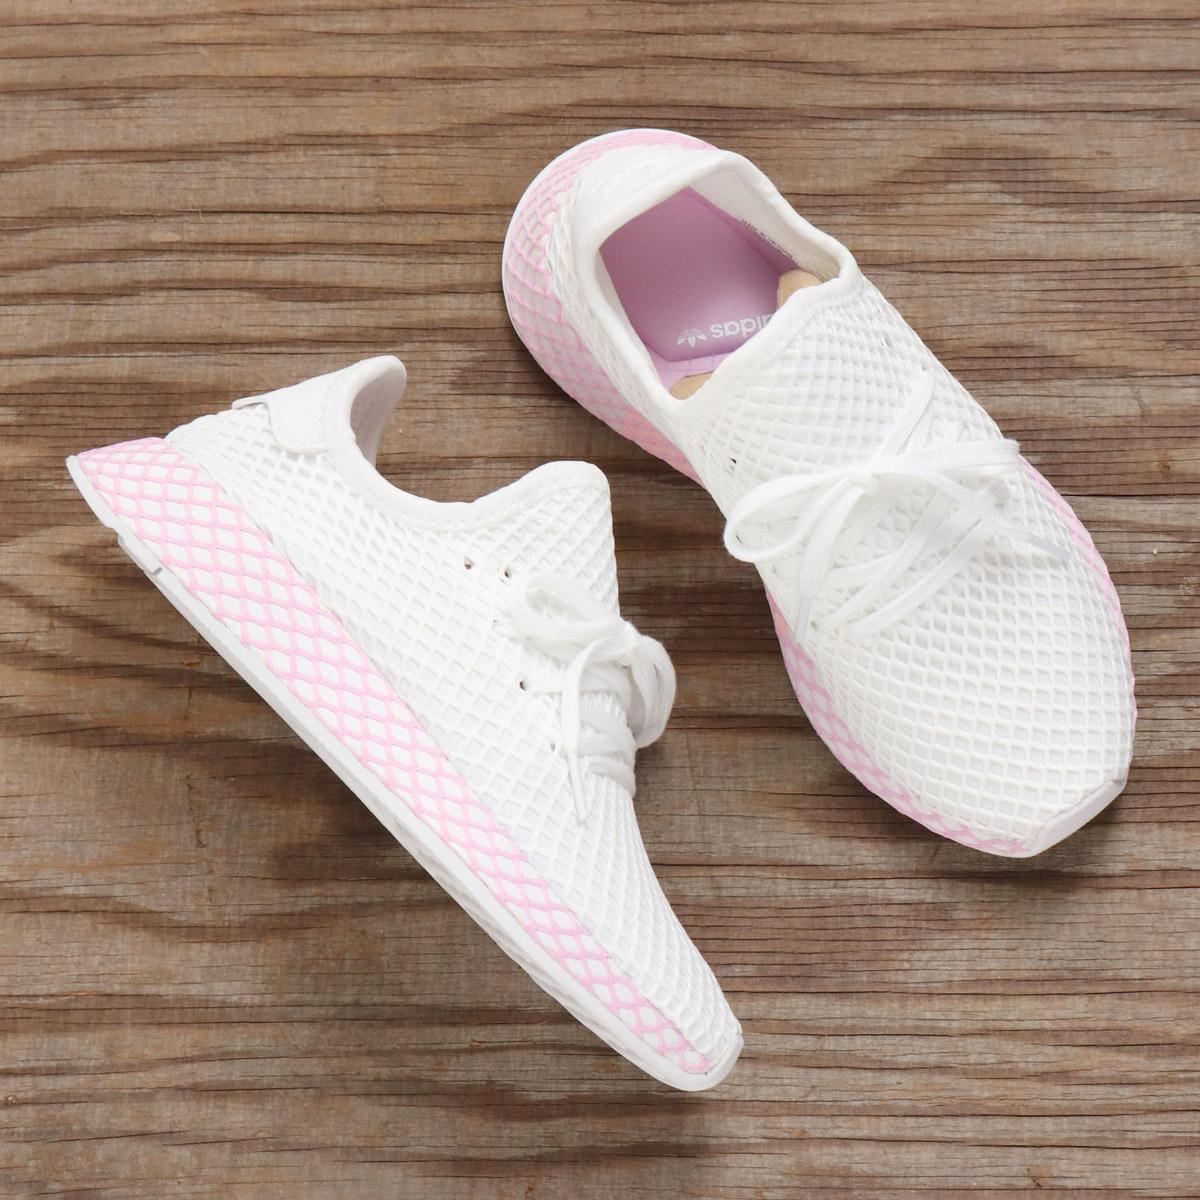 adidas Originals DEERUPT RUNNER W(アディダス オリジナルス ディーラプトランナーW)RUNNING WHITE/RUNNING WHITE/CLEAR LILAC【メンズ レディース スニーカー】18FA-I